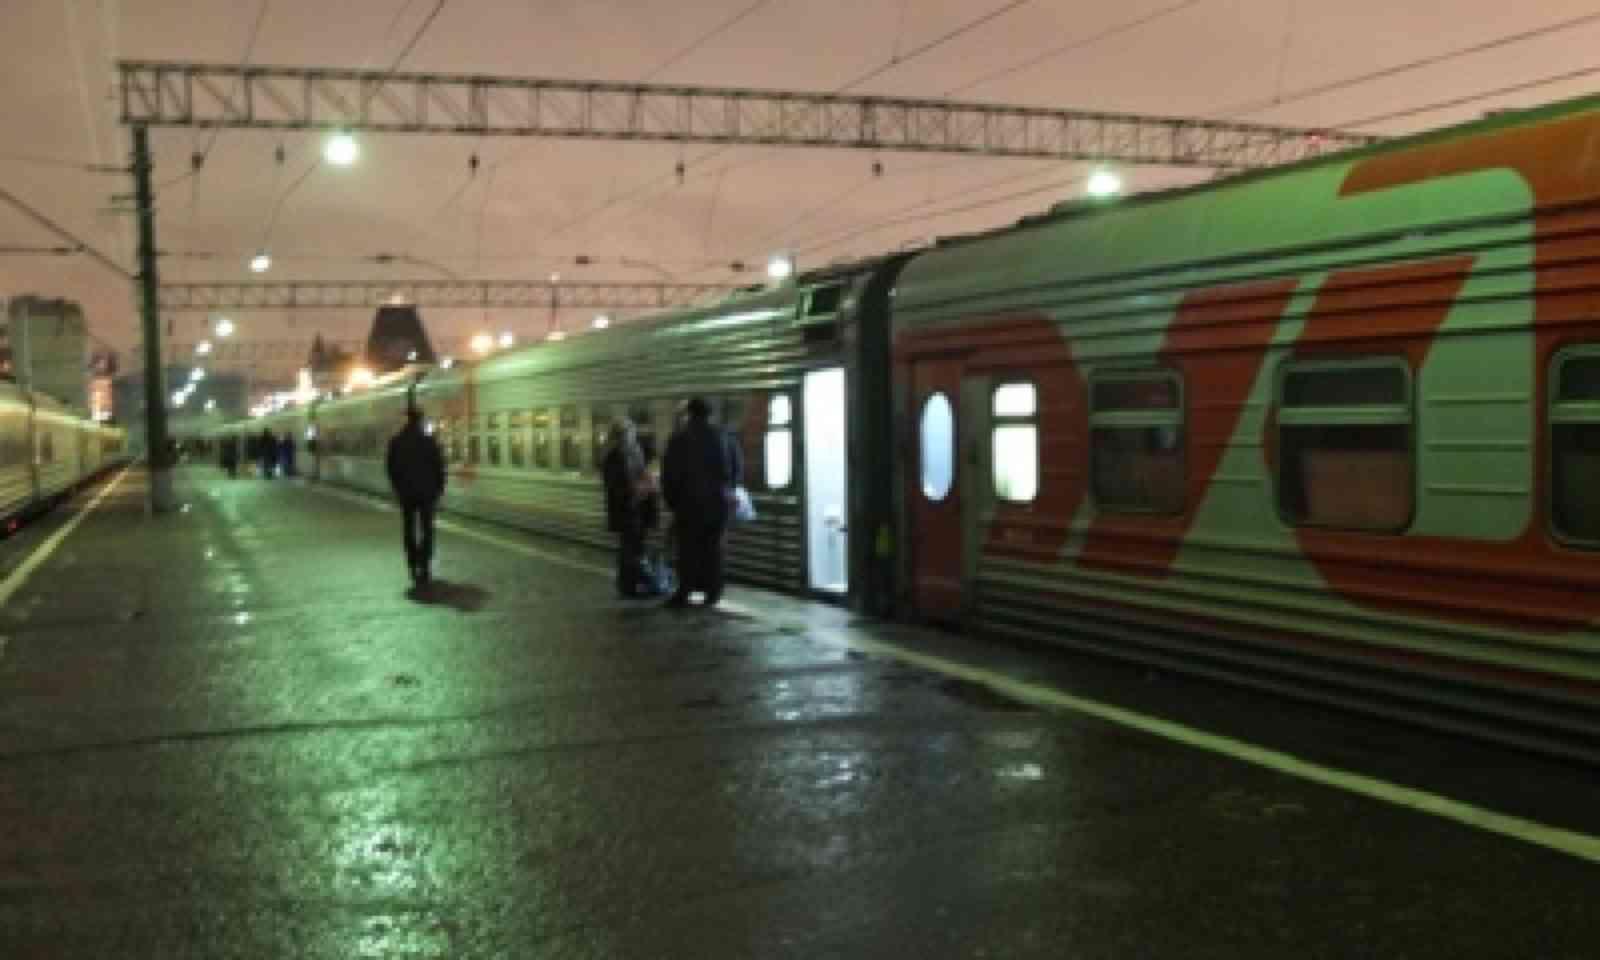 Train No 020 (Matthew Woodward)